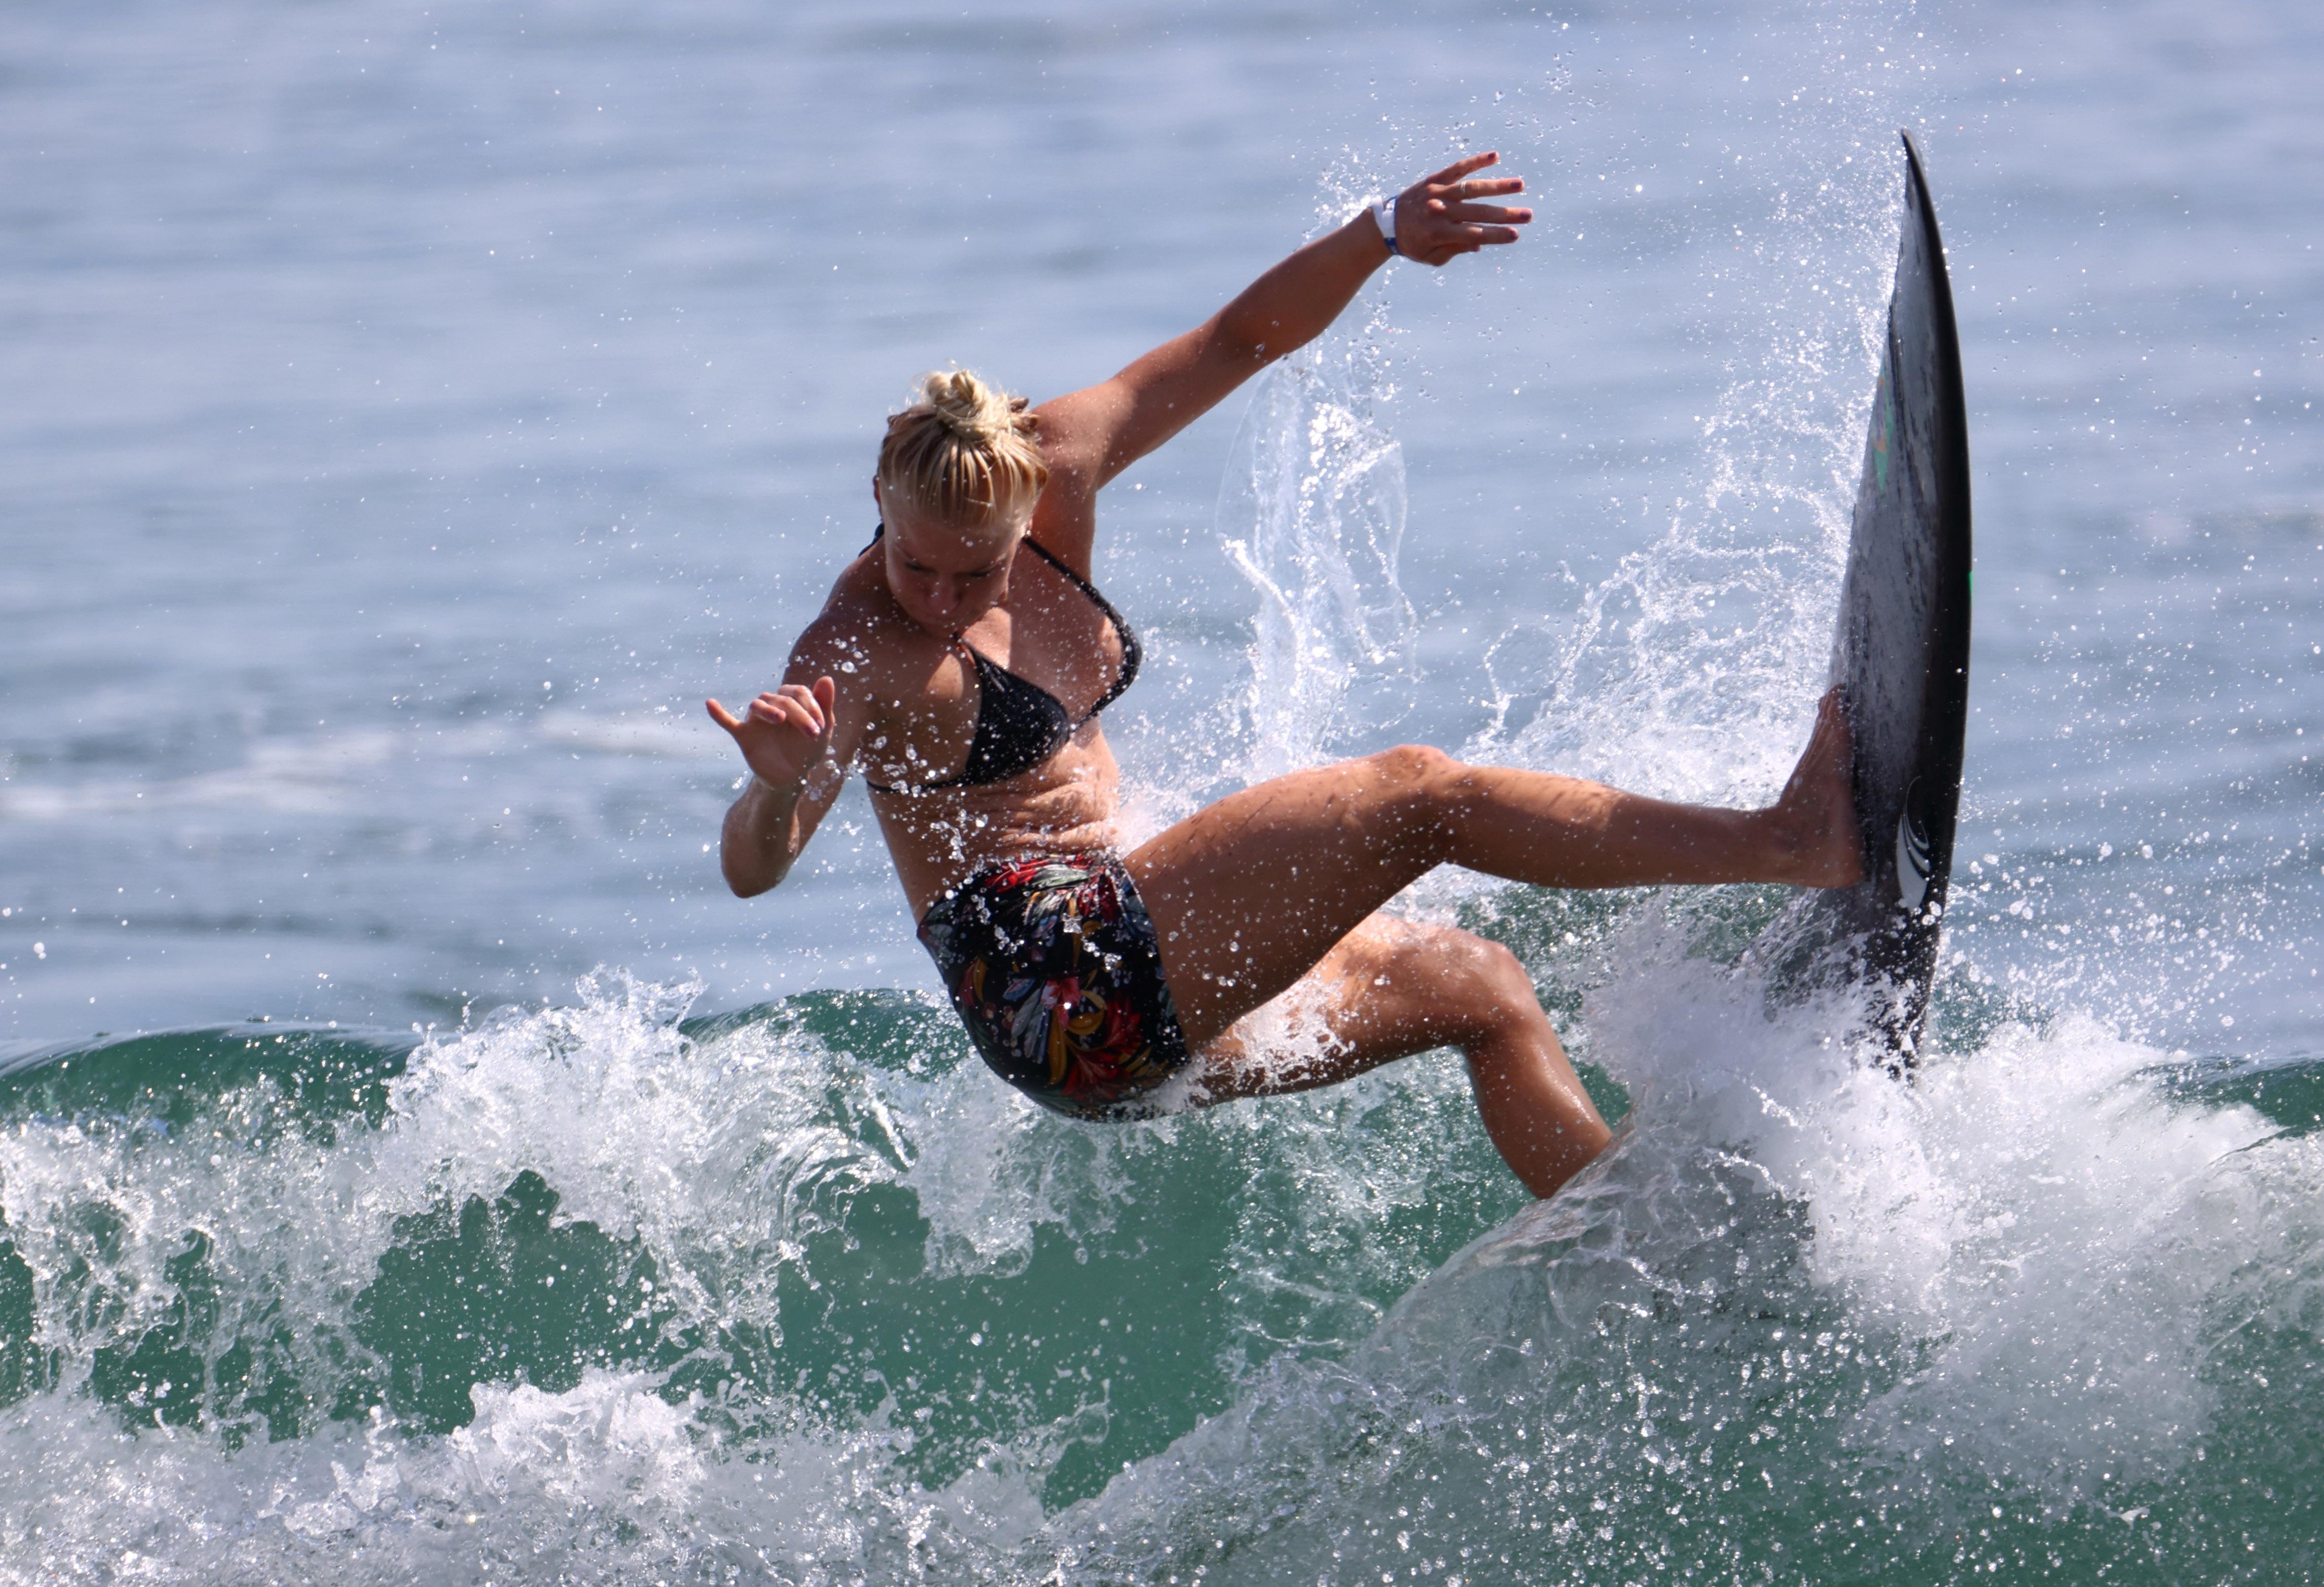 Tokyo 2020 Olympics - Surfing Training - Tsurigasaki Surfing Beach, Tokyo, Japan - July 23, 2021 Tatiana Weston-Webb of Brazil during training REUTERS/Lisi Niesner/File Photo